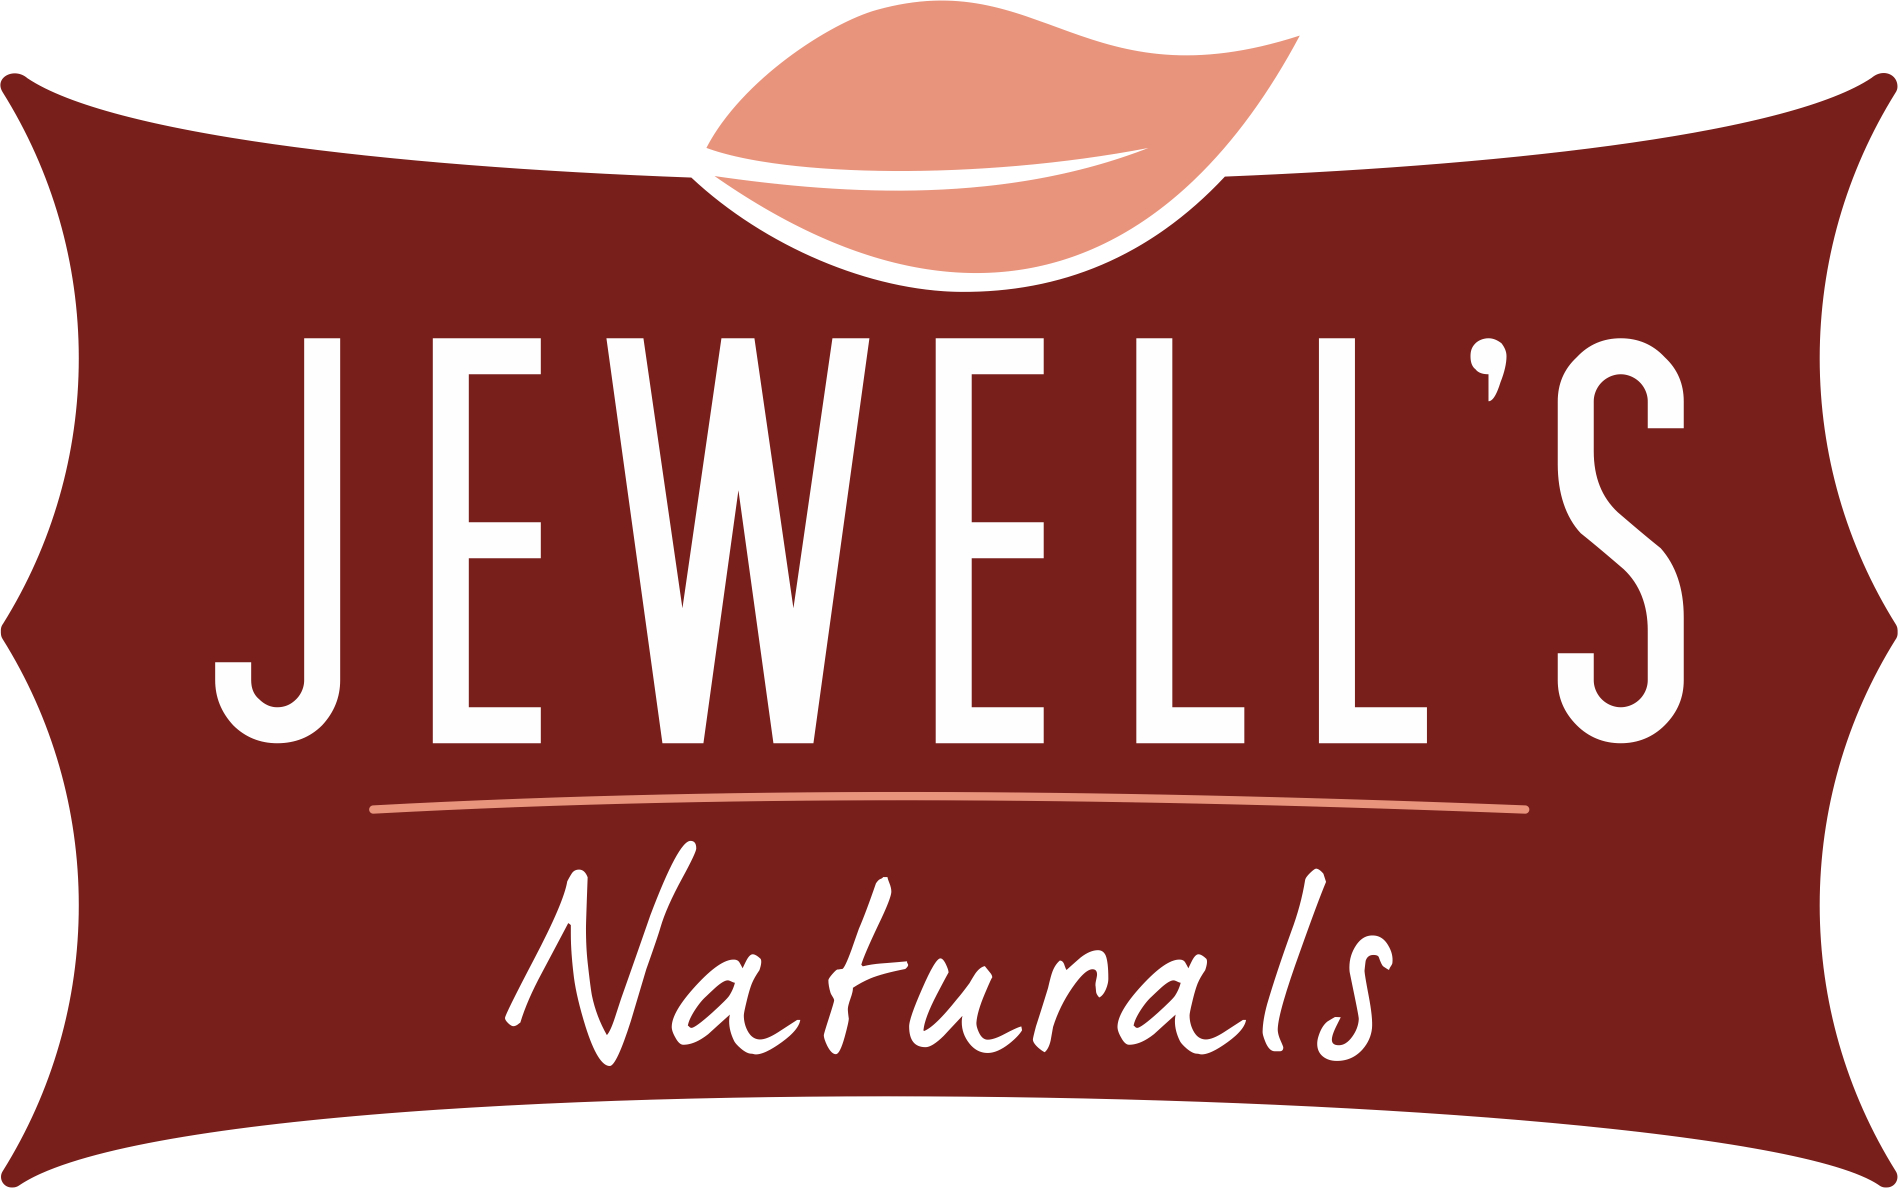 Jewell's Naturals